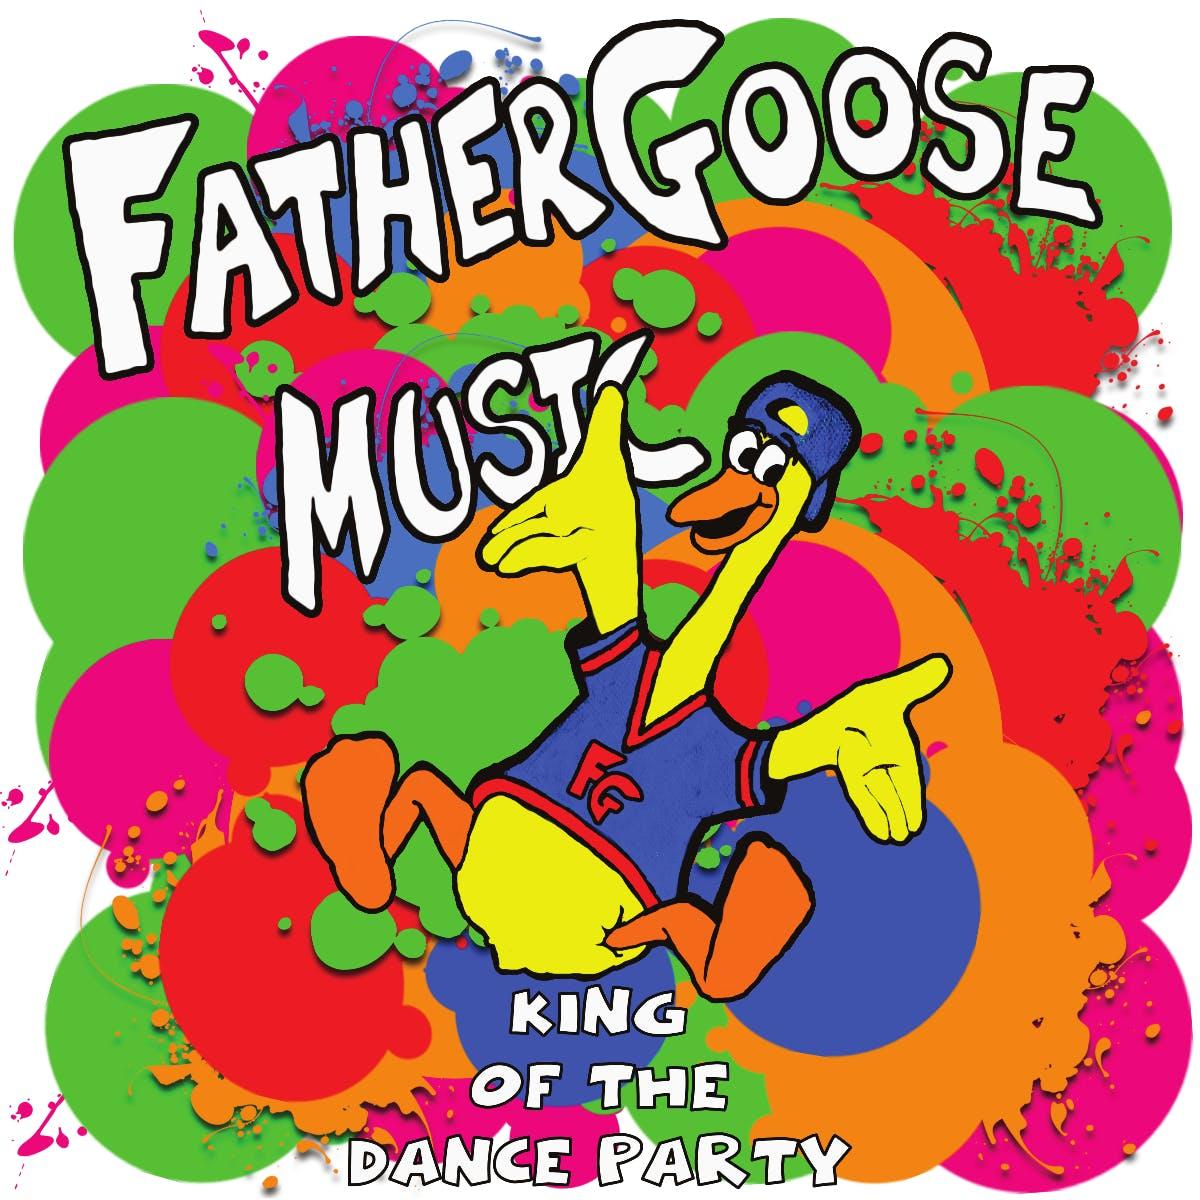 Father Goose Music & Kidz Hub Media Network